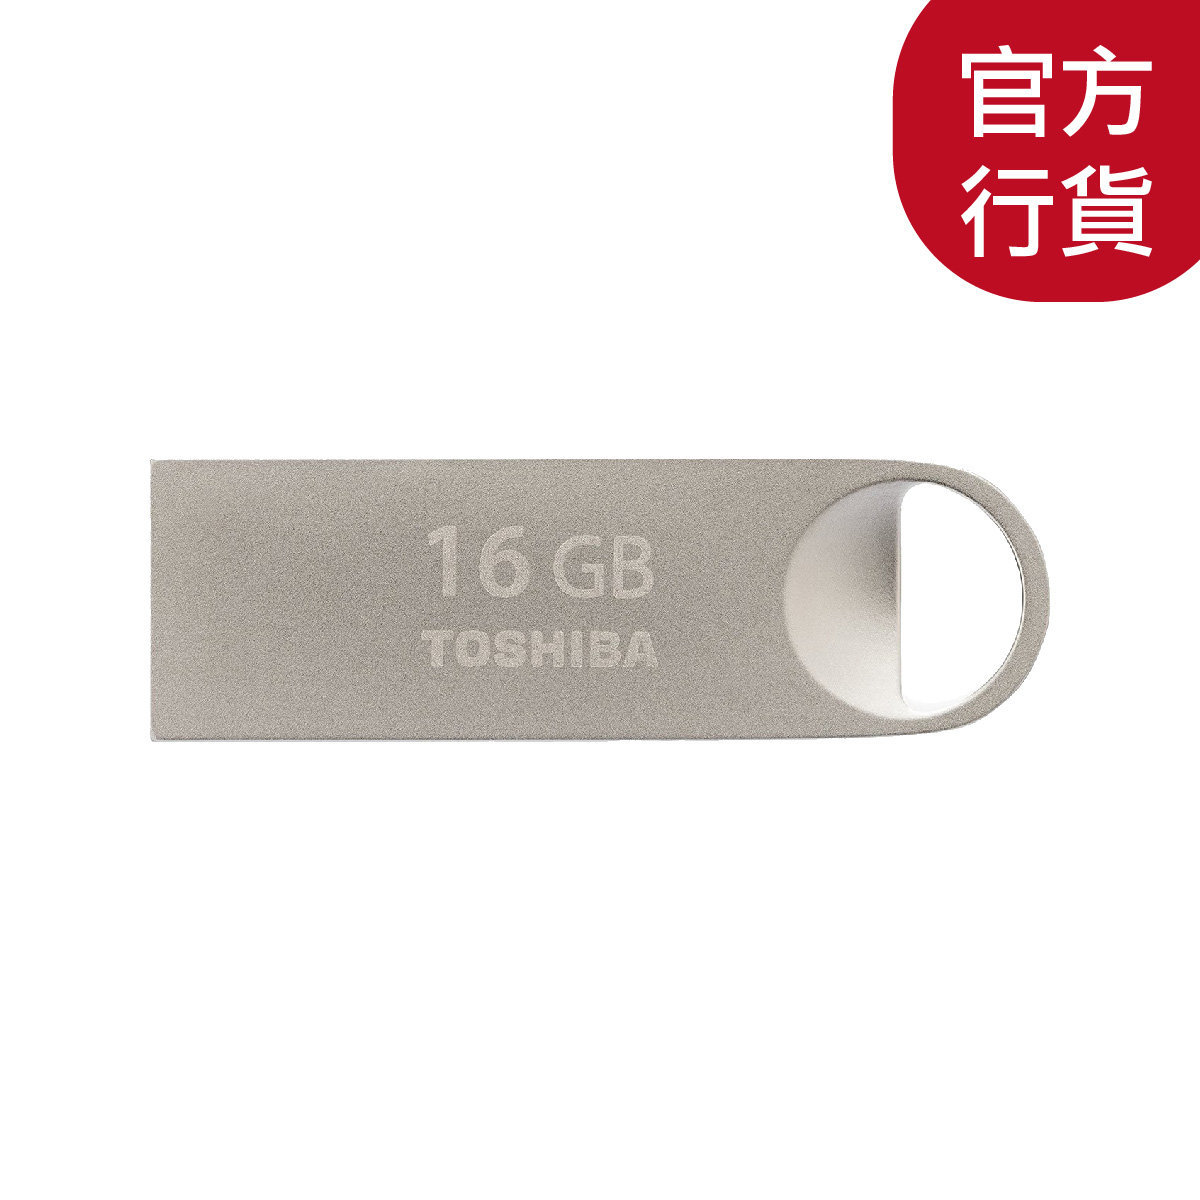 16GB TransMemory™ U401 USB2.0 Memory Stick Metal